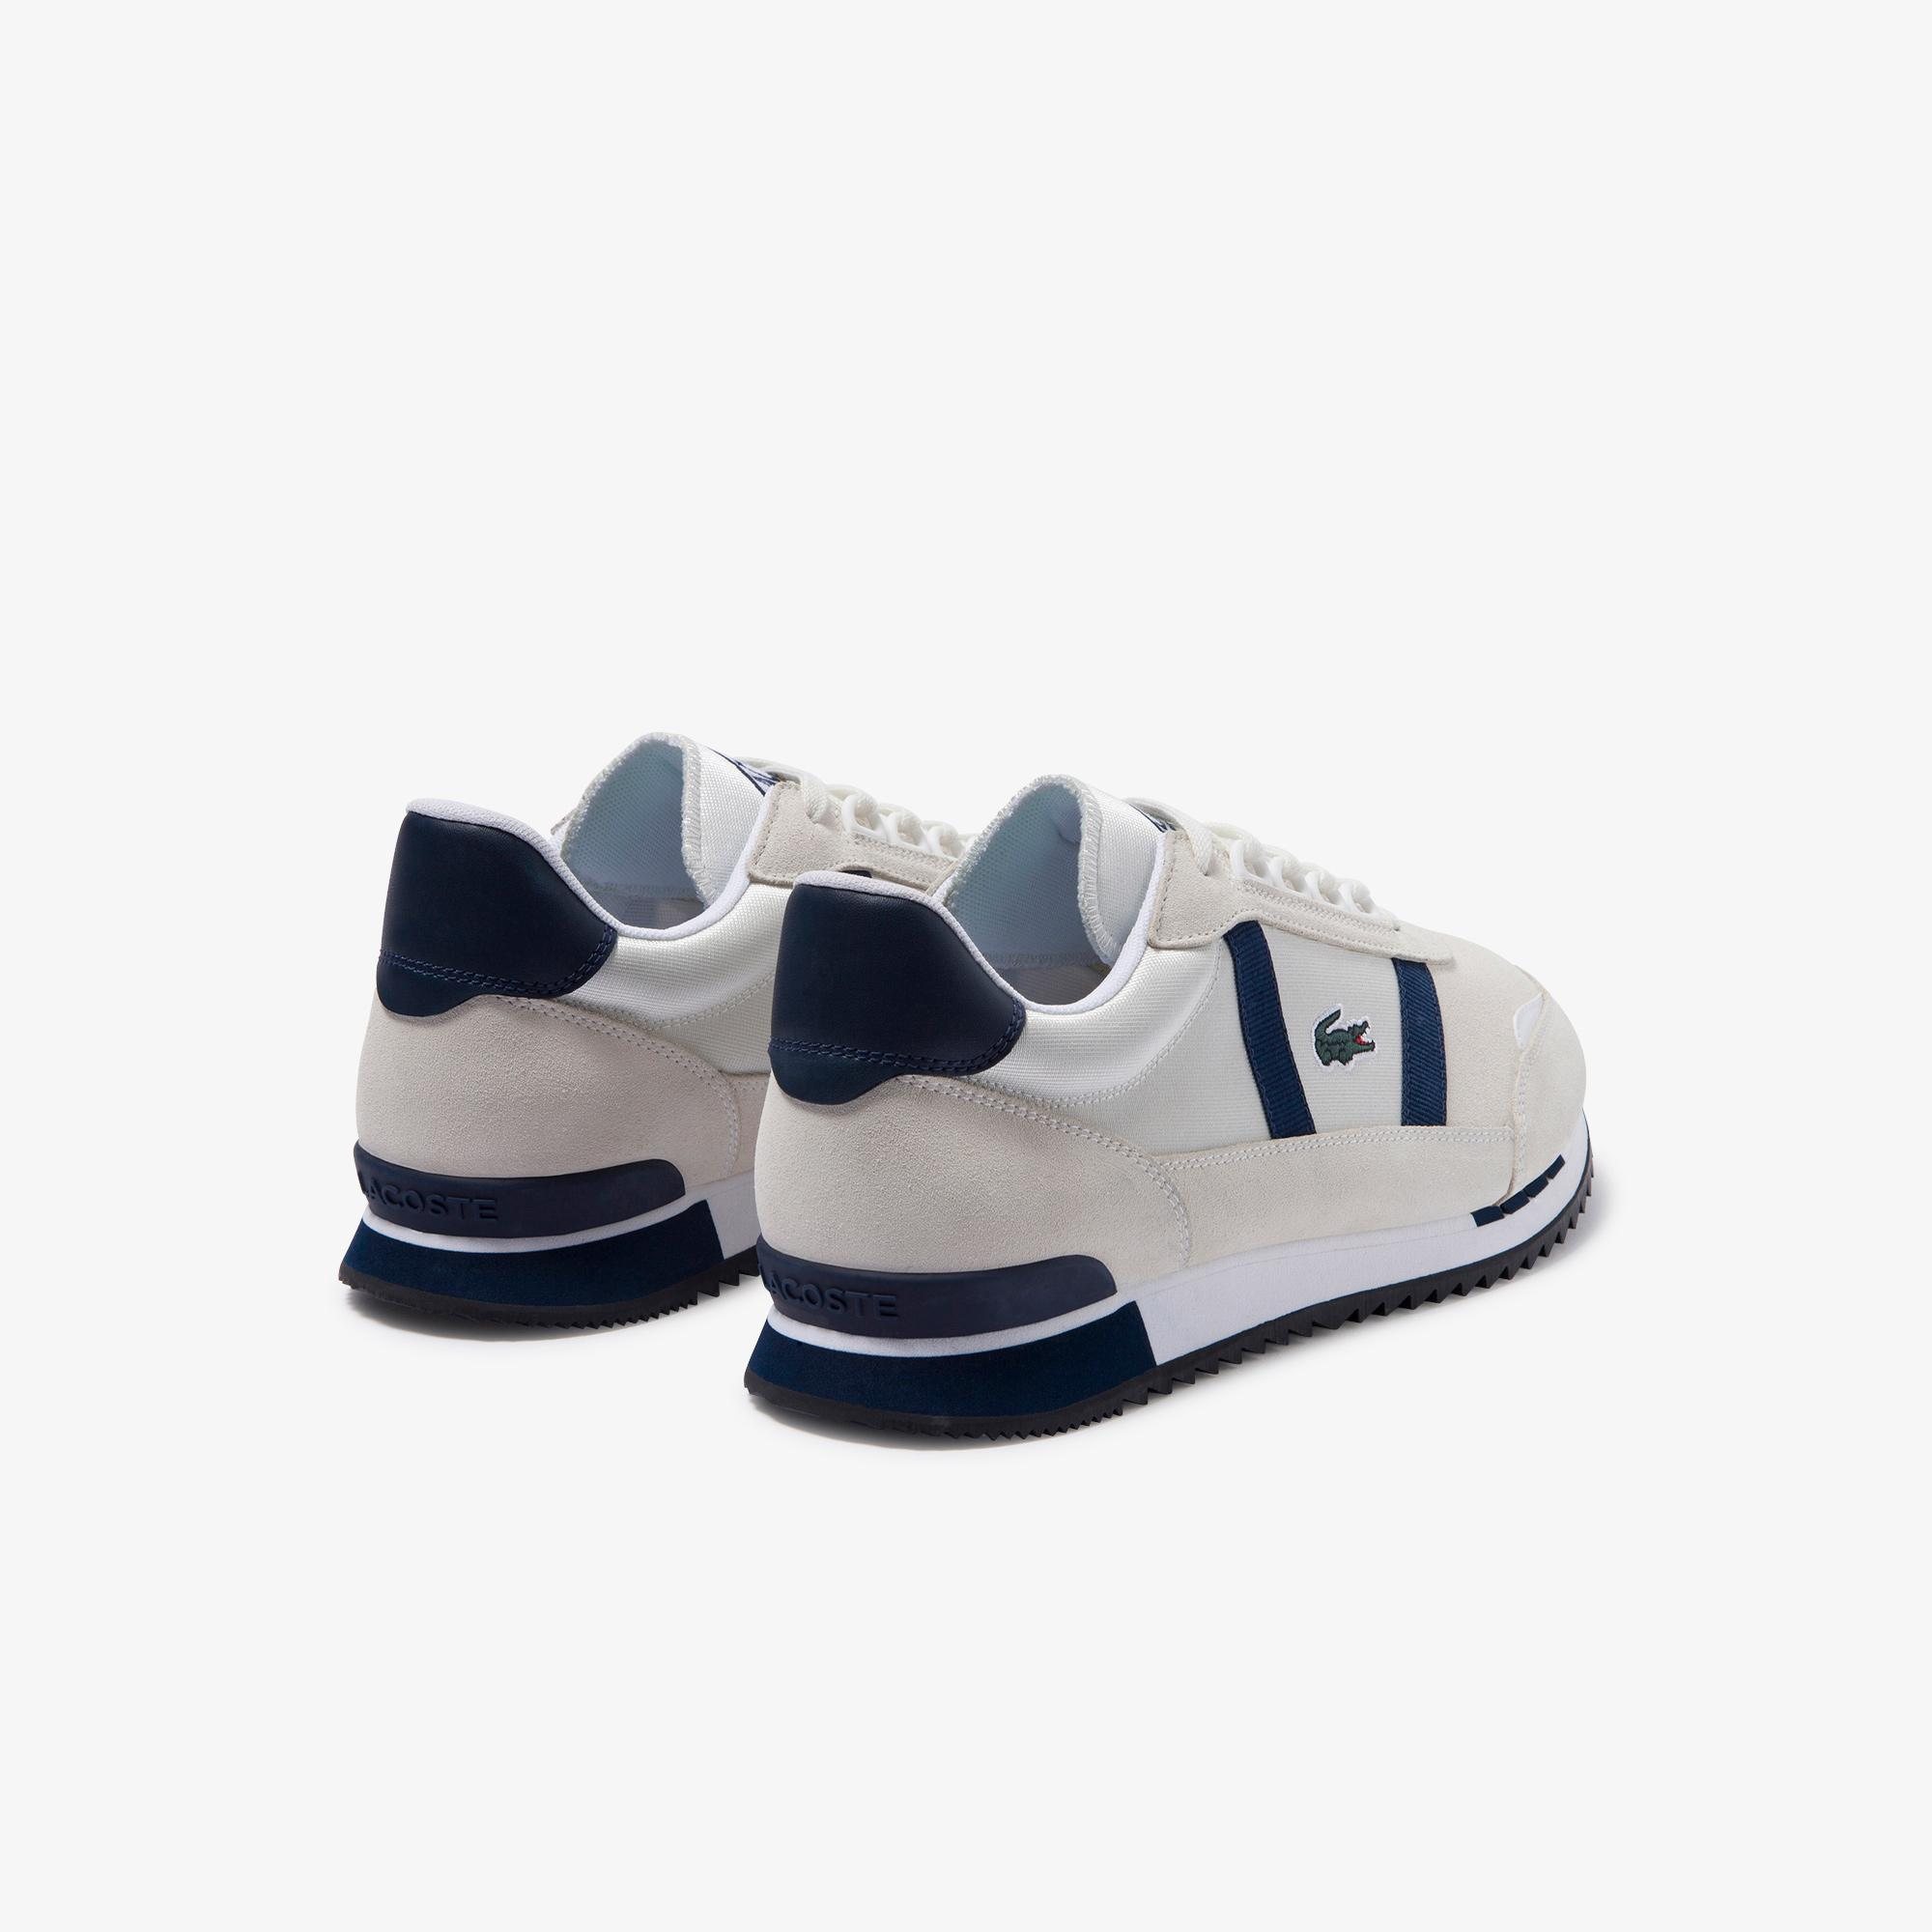 Lacoste Partner Retro 120 1 Sma Erkek Beyaz - Lacivert Sneaker